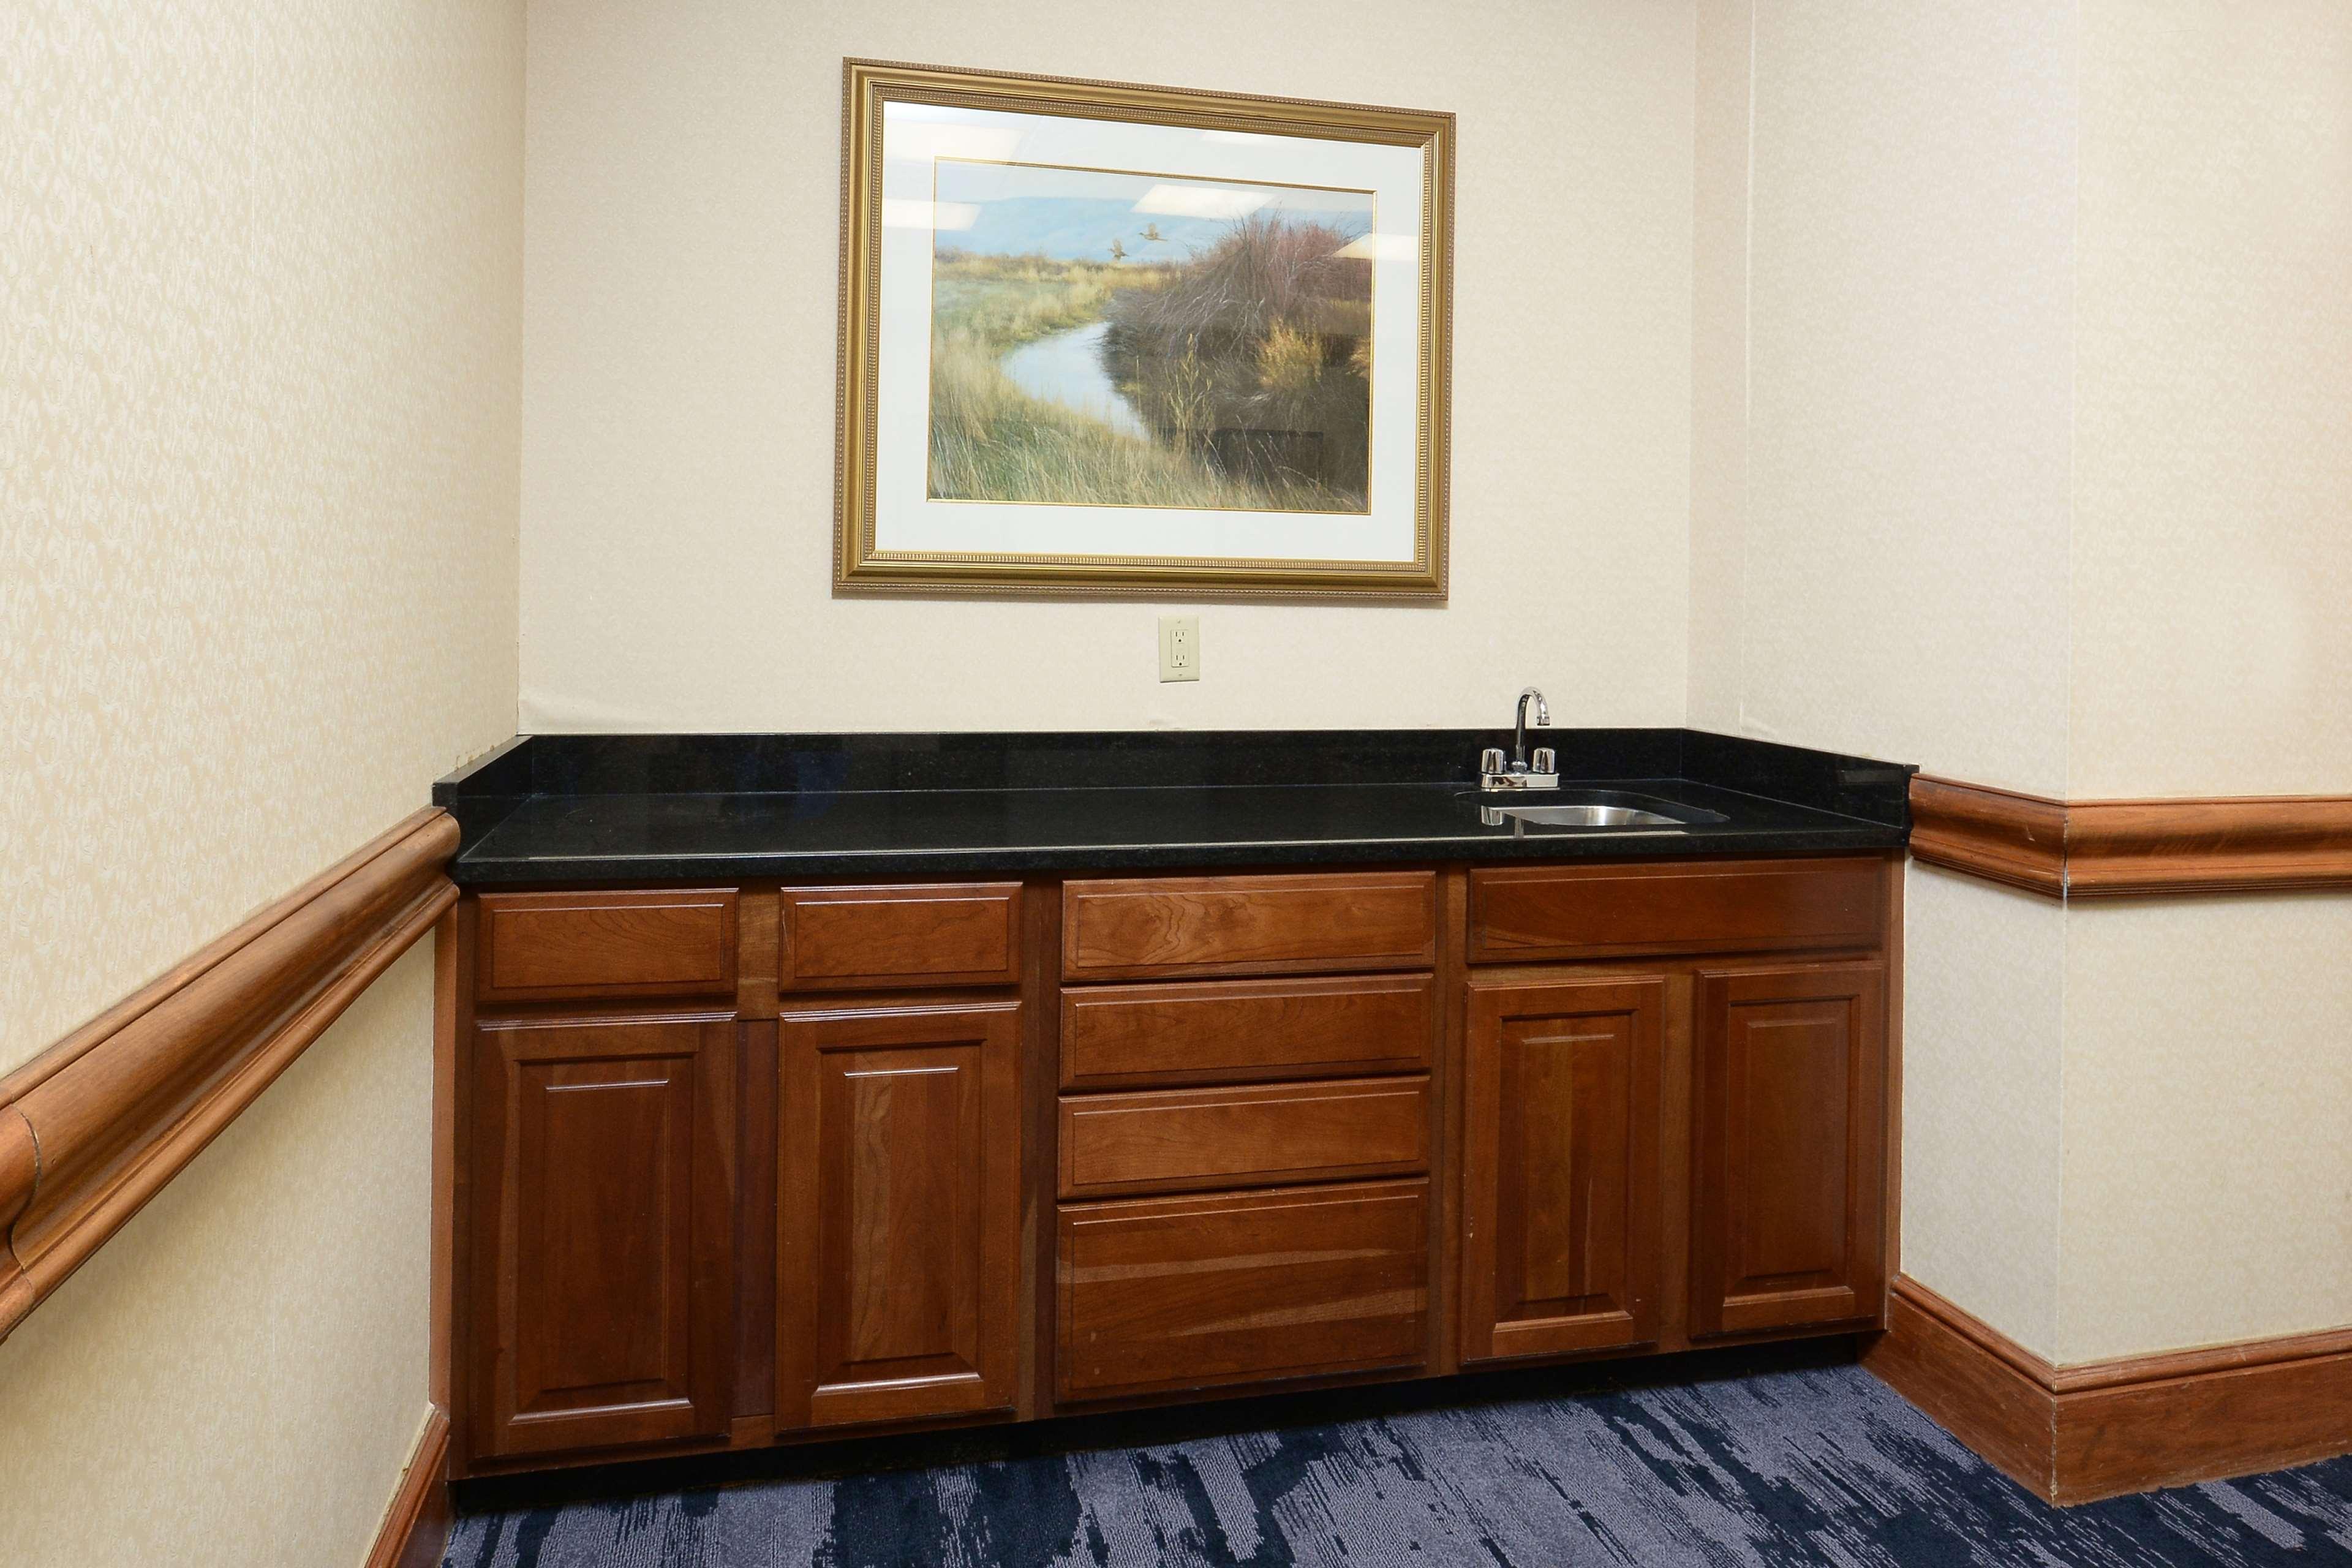 Hampton Inn & Suites Greenville/Spartanburg I-85 image 17